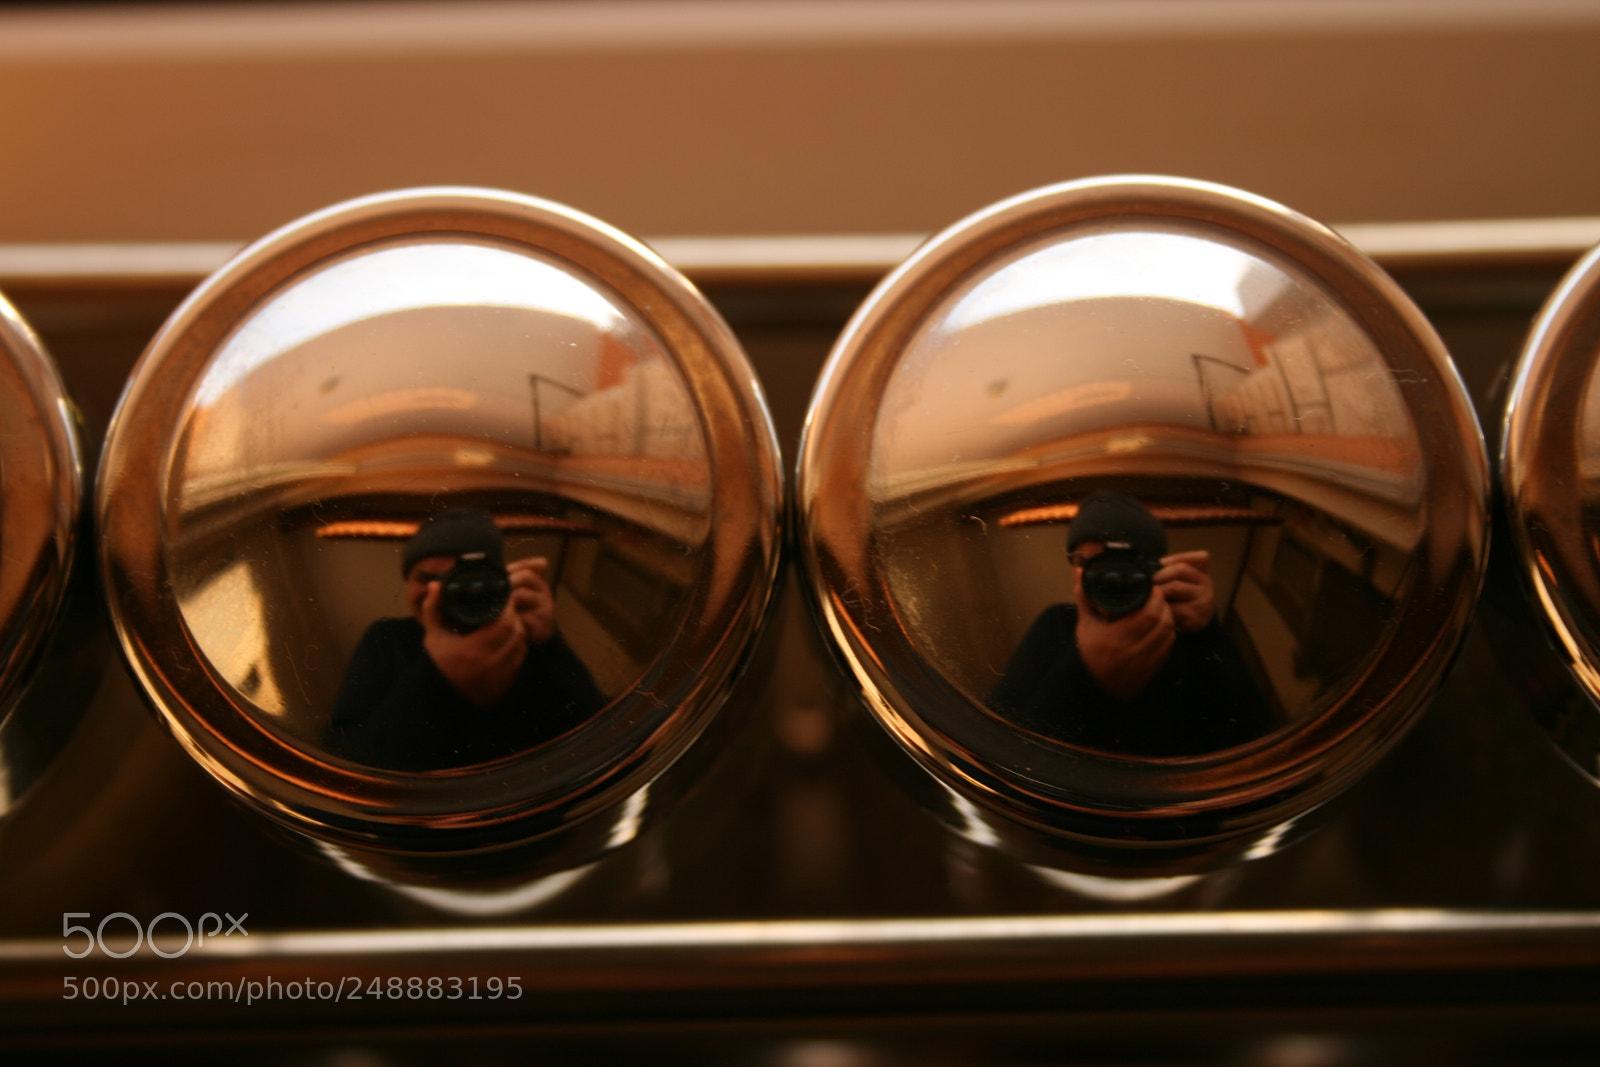 Tuzluk ve biberlik, Canon EOS KISS DIGITAL X, Canon EF-S 18-55mm f/3.5-5.6 USM